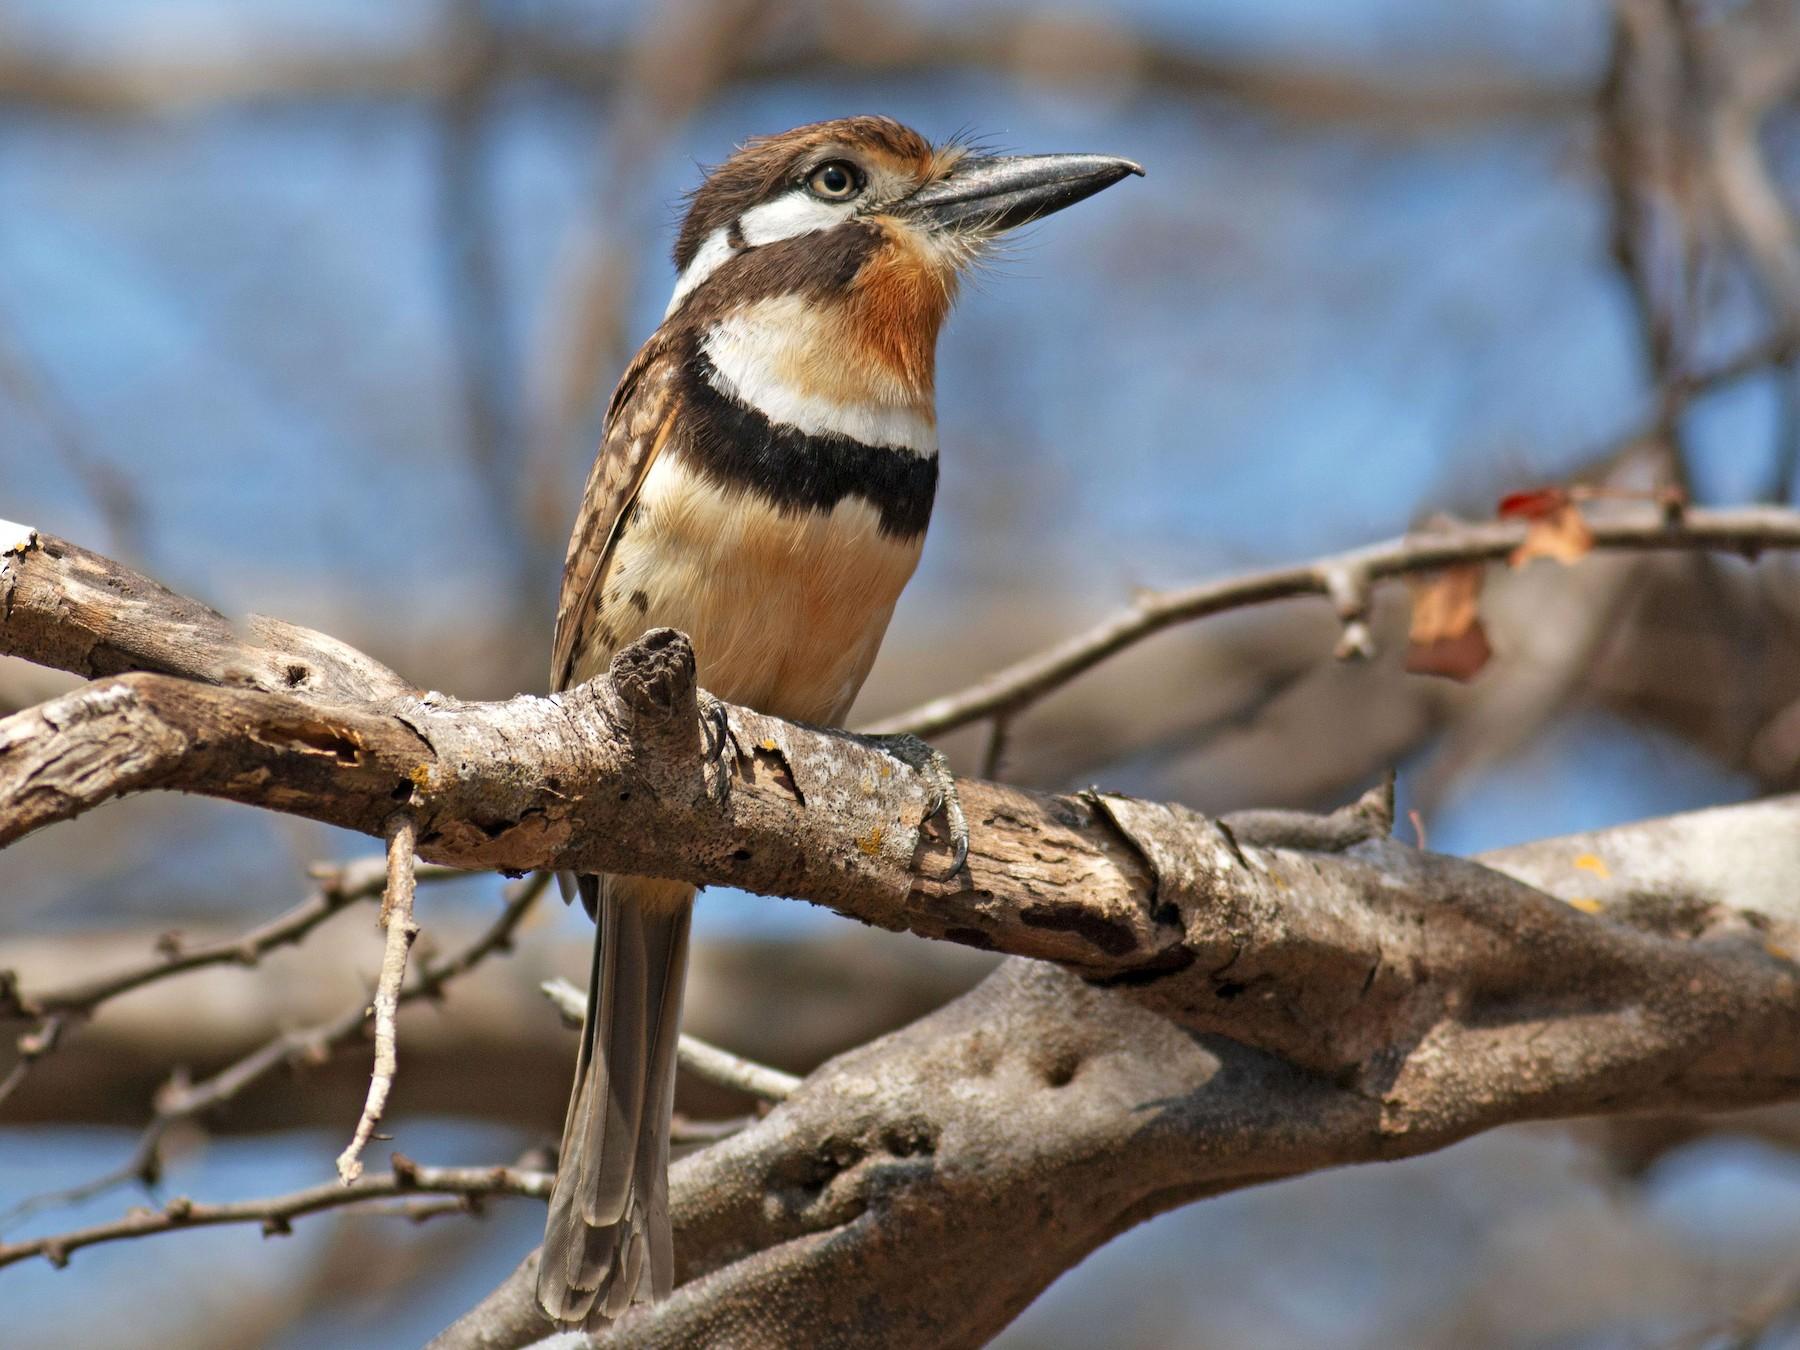 Russet-throated Puffbird - Jose Illanes